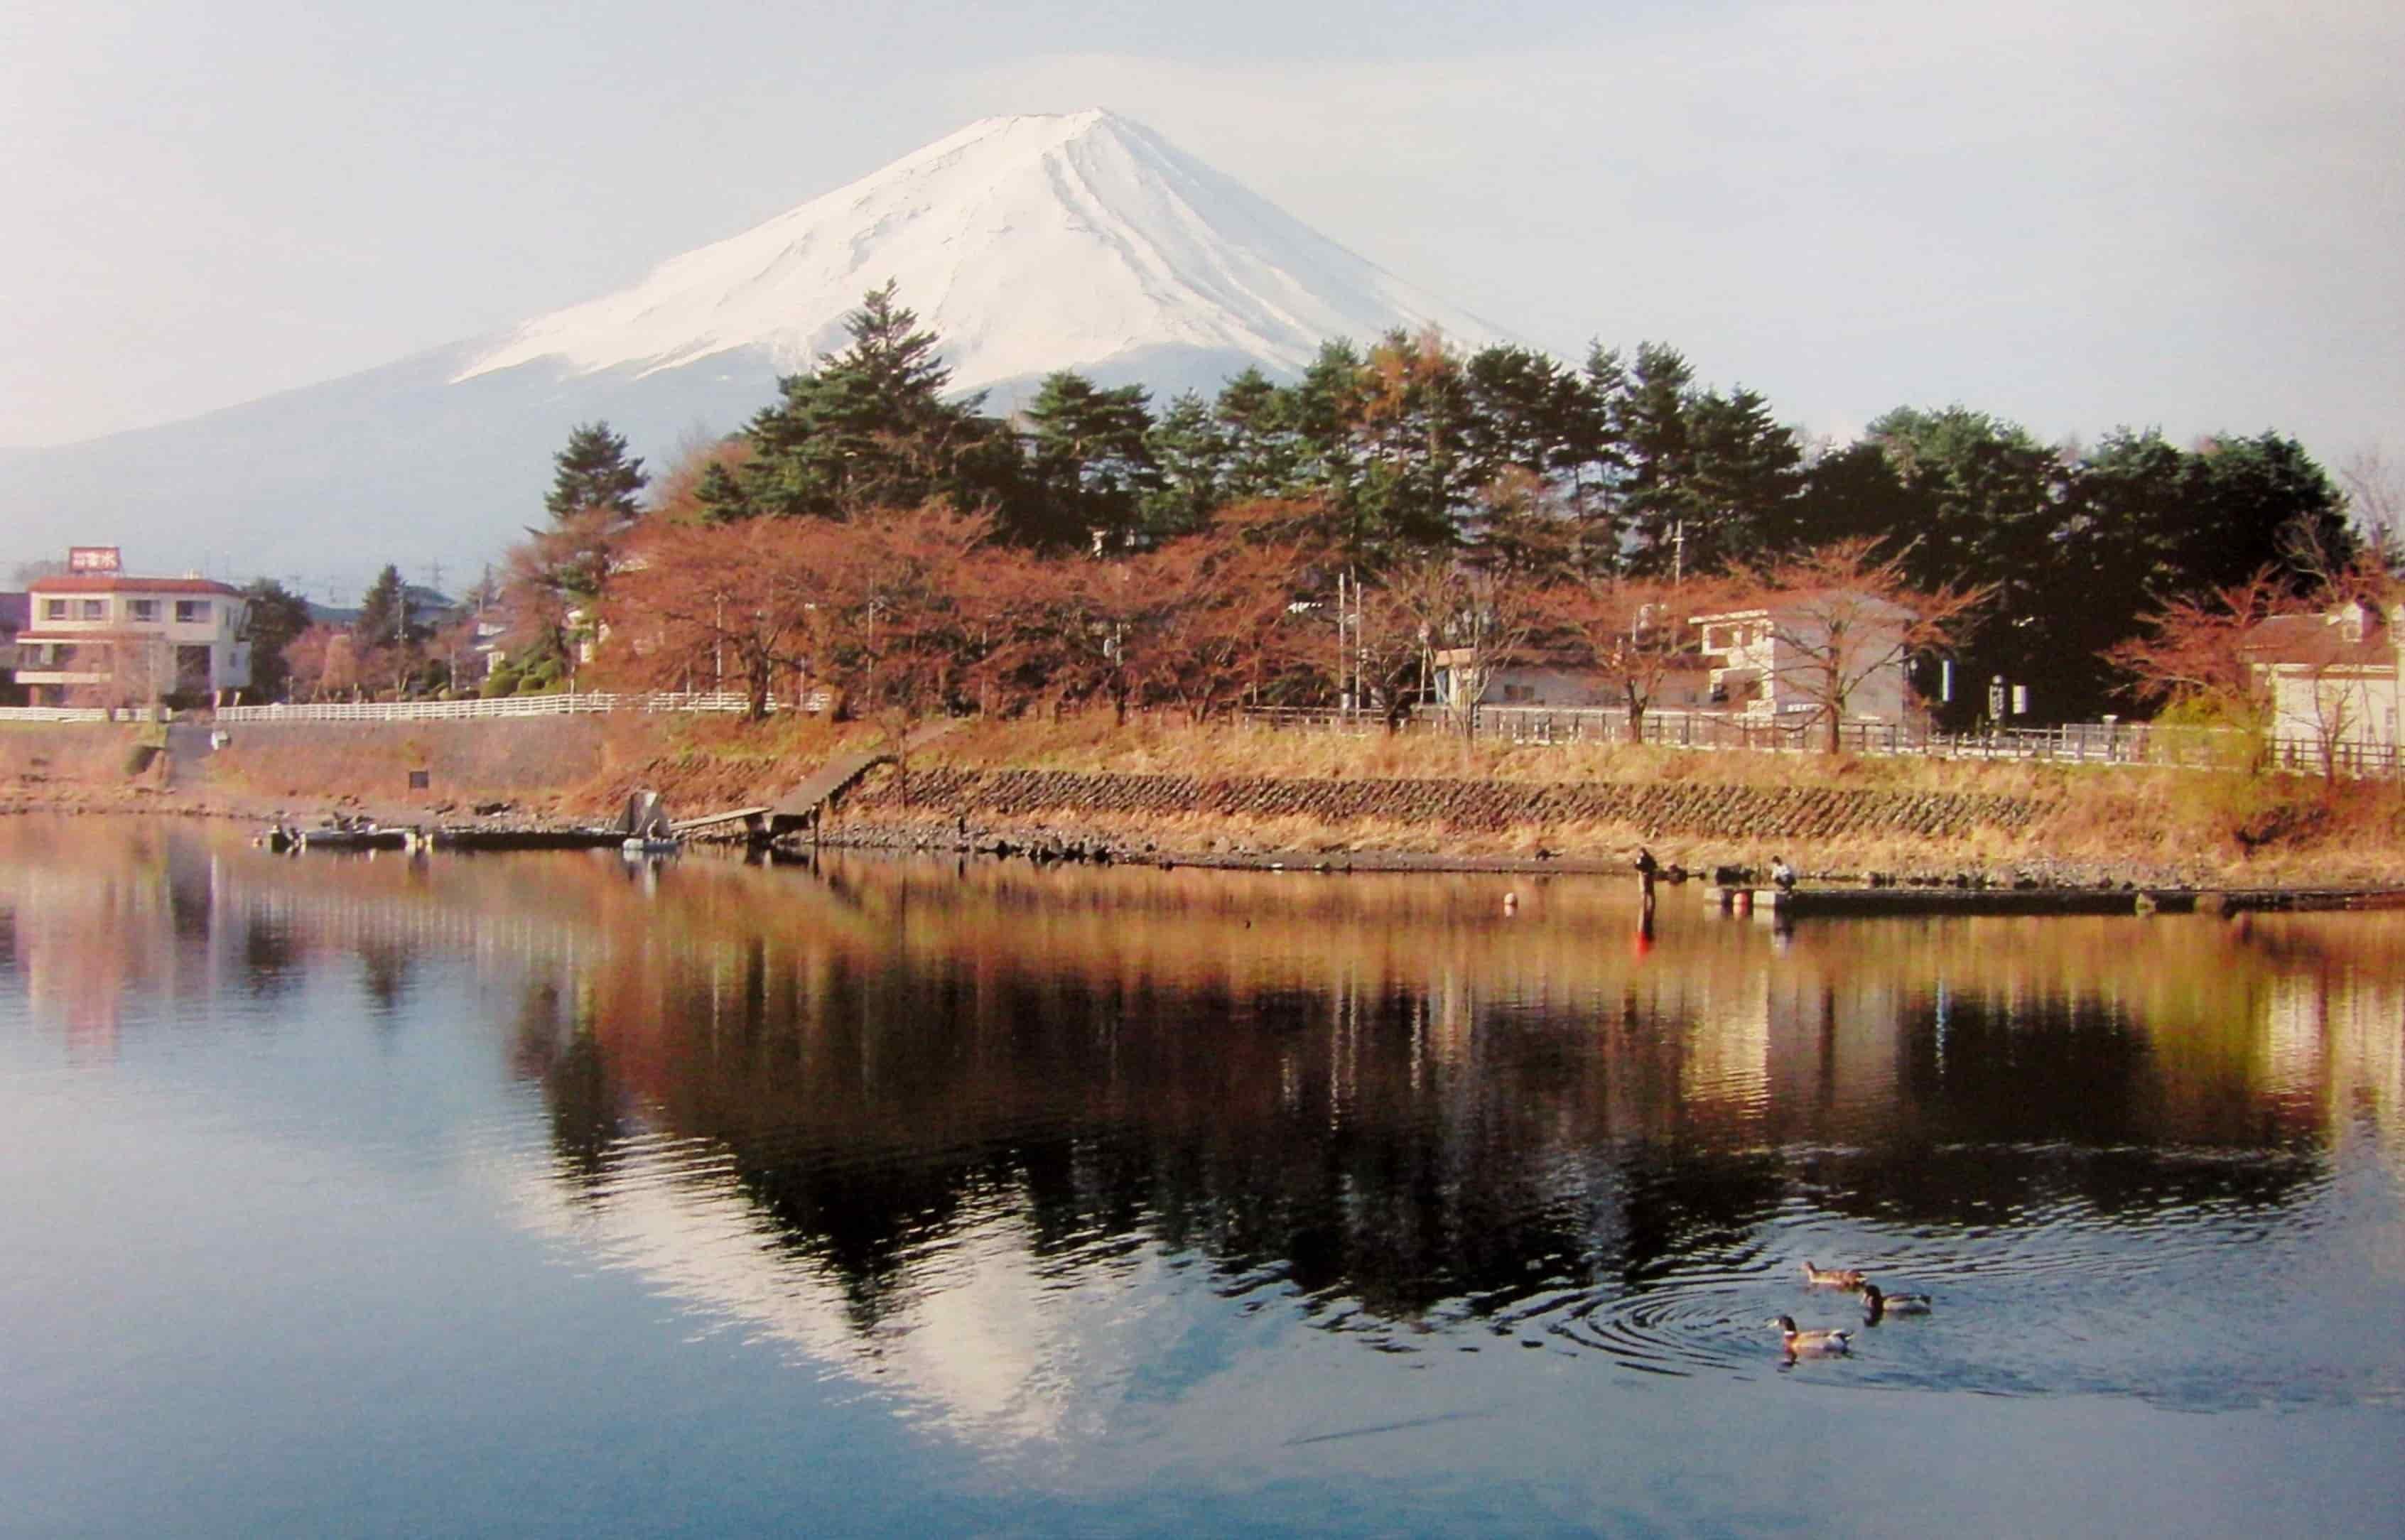 fuji hakone izu national park where to go japan